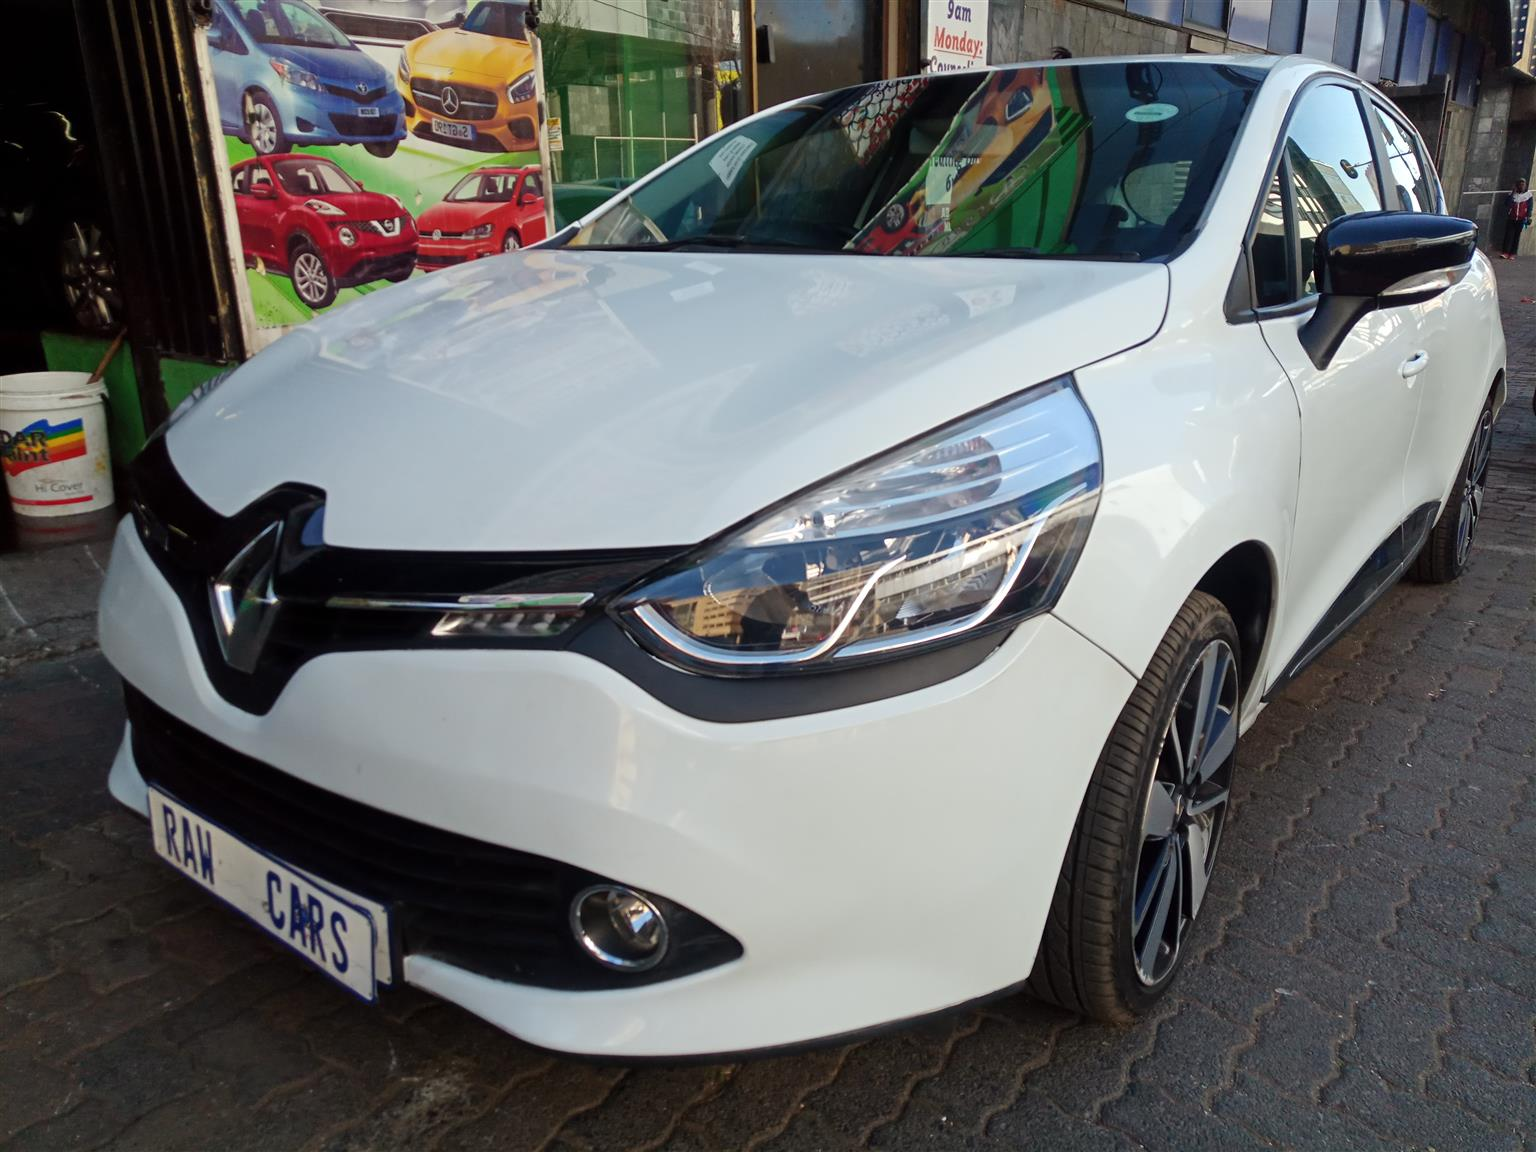 2016 Renault Clio 1.4 Expression 5 door